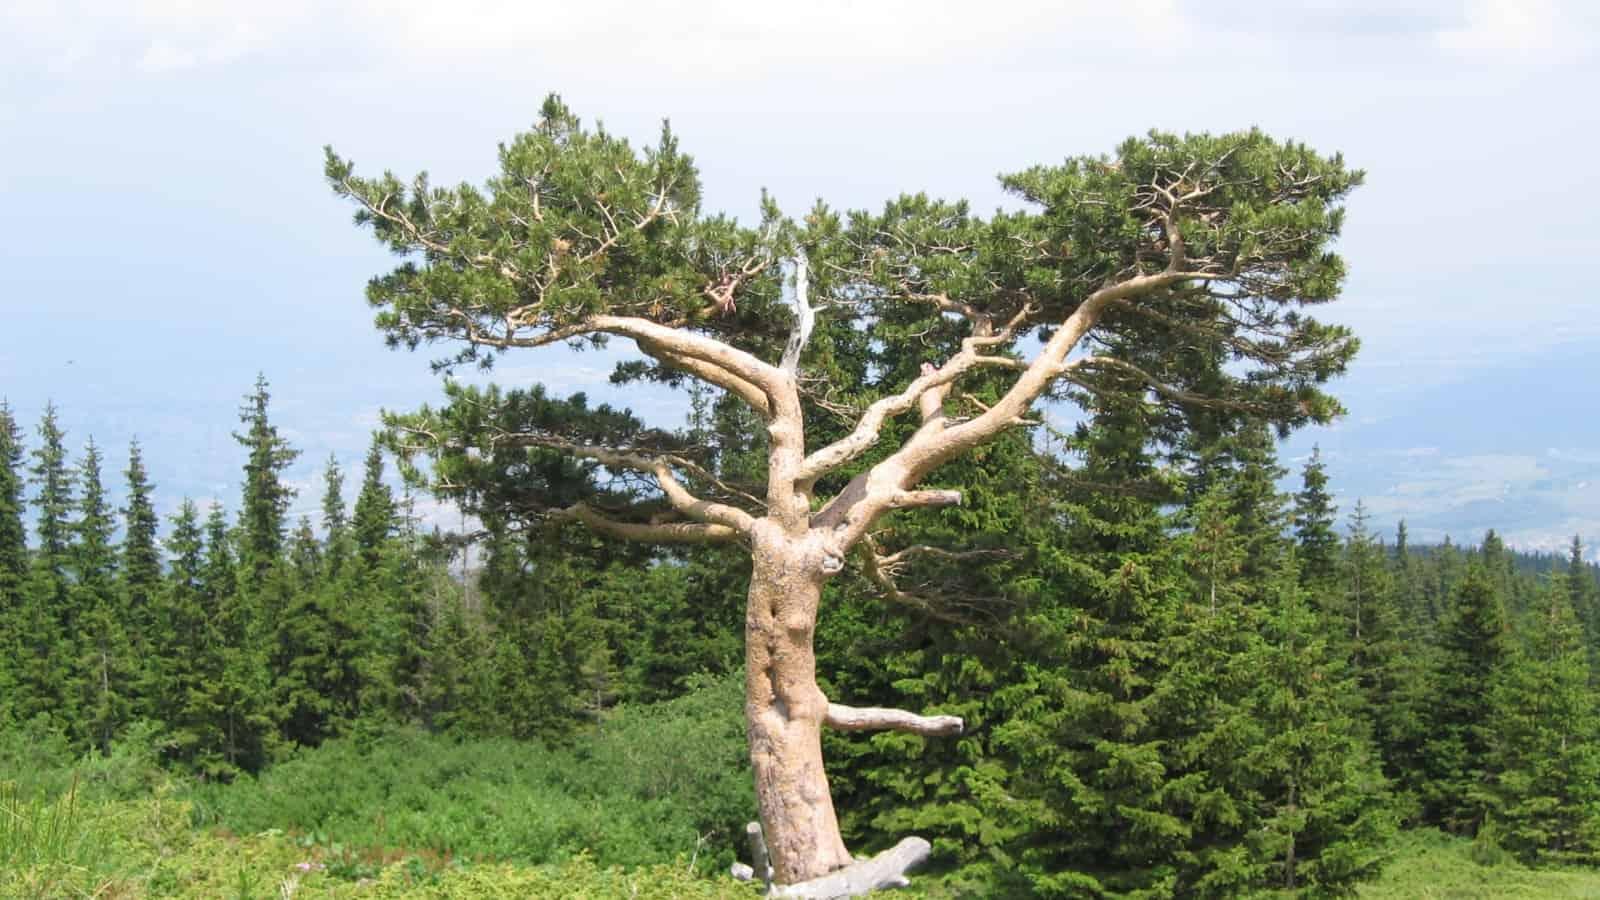 The most famous tree in Vitosha Nature Park - photo: Vitosha Nature Park